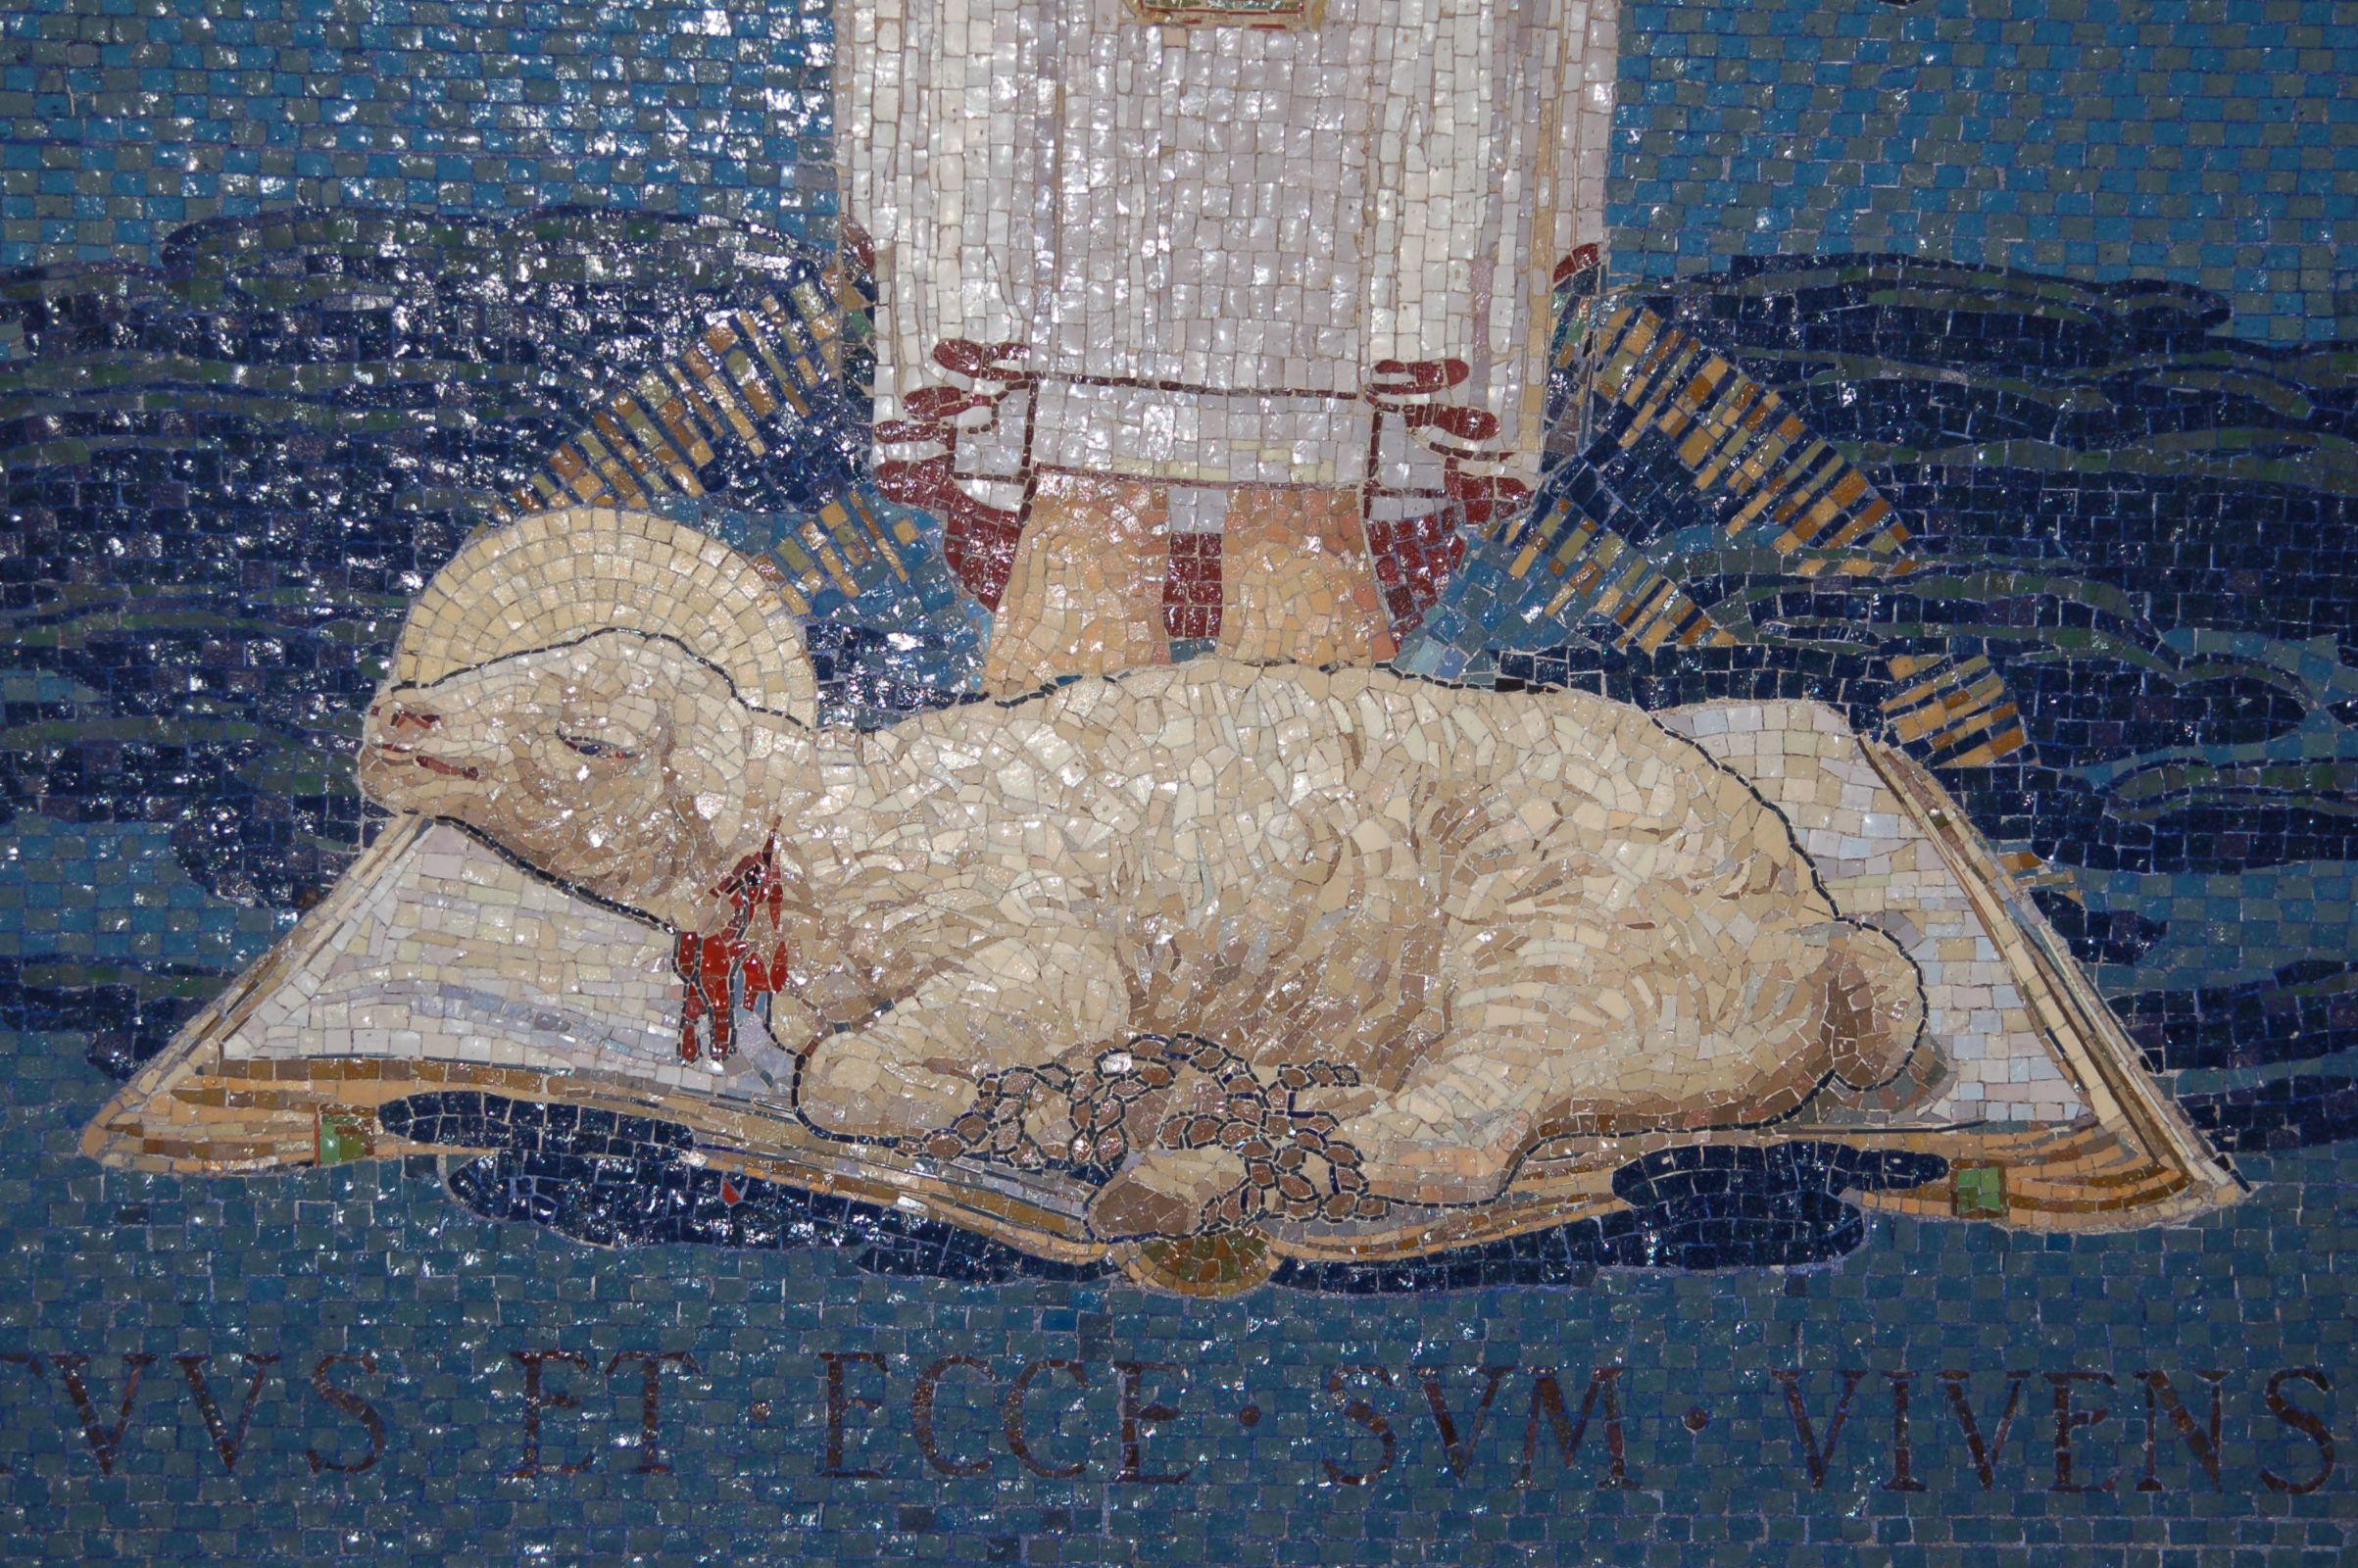 Image 17 The Sacrificial Lamb